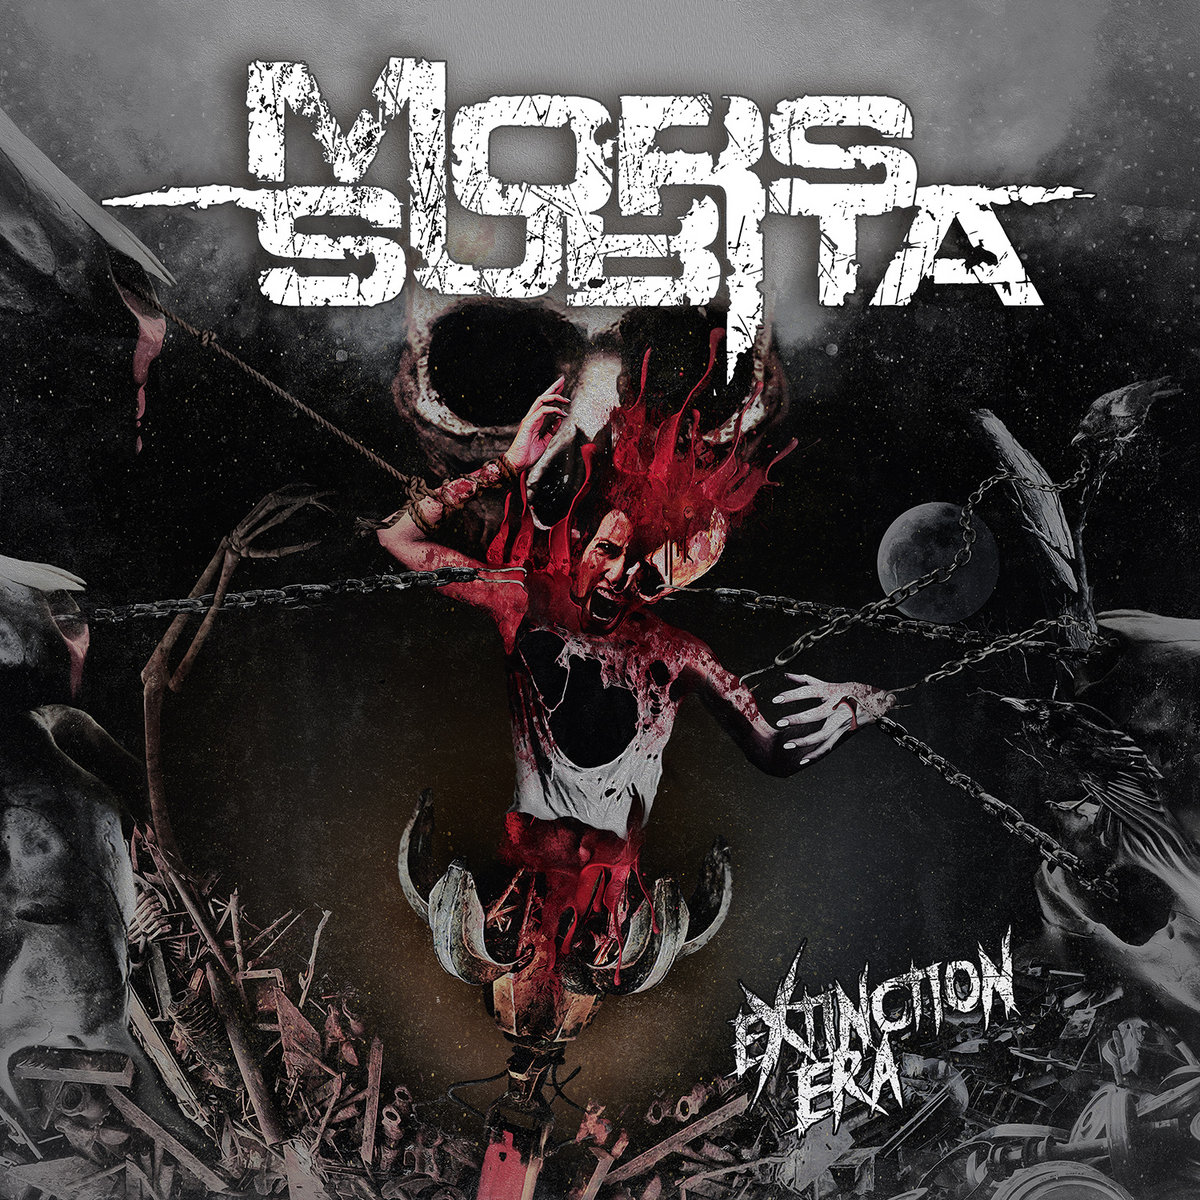 REVIEW: Mors Subita – Extinction Era